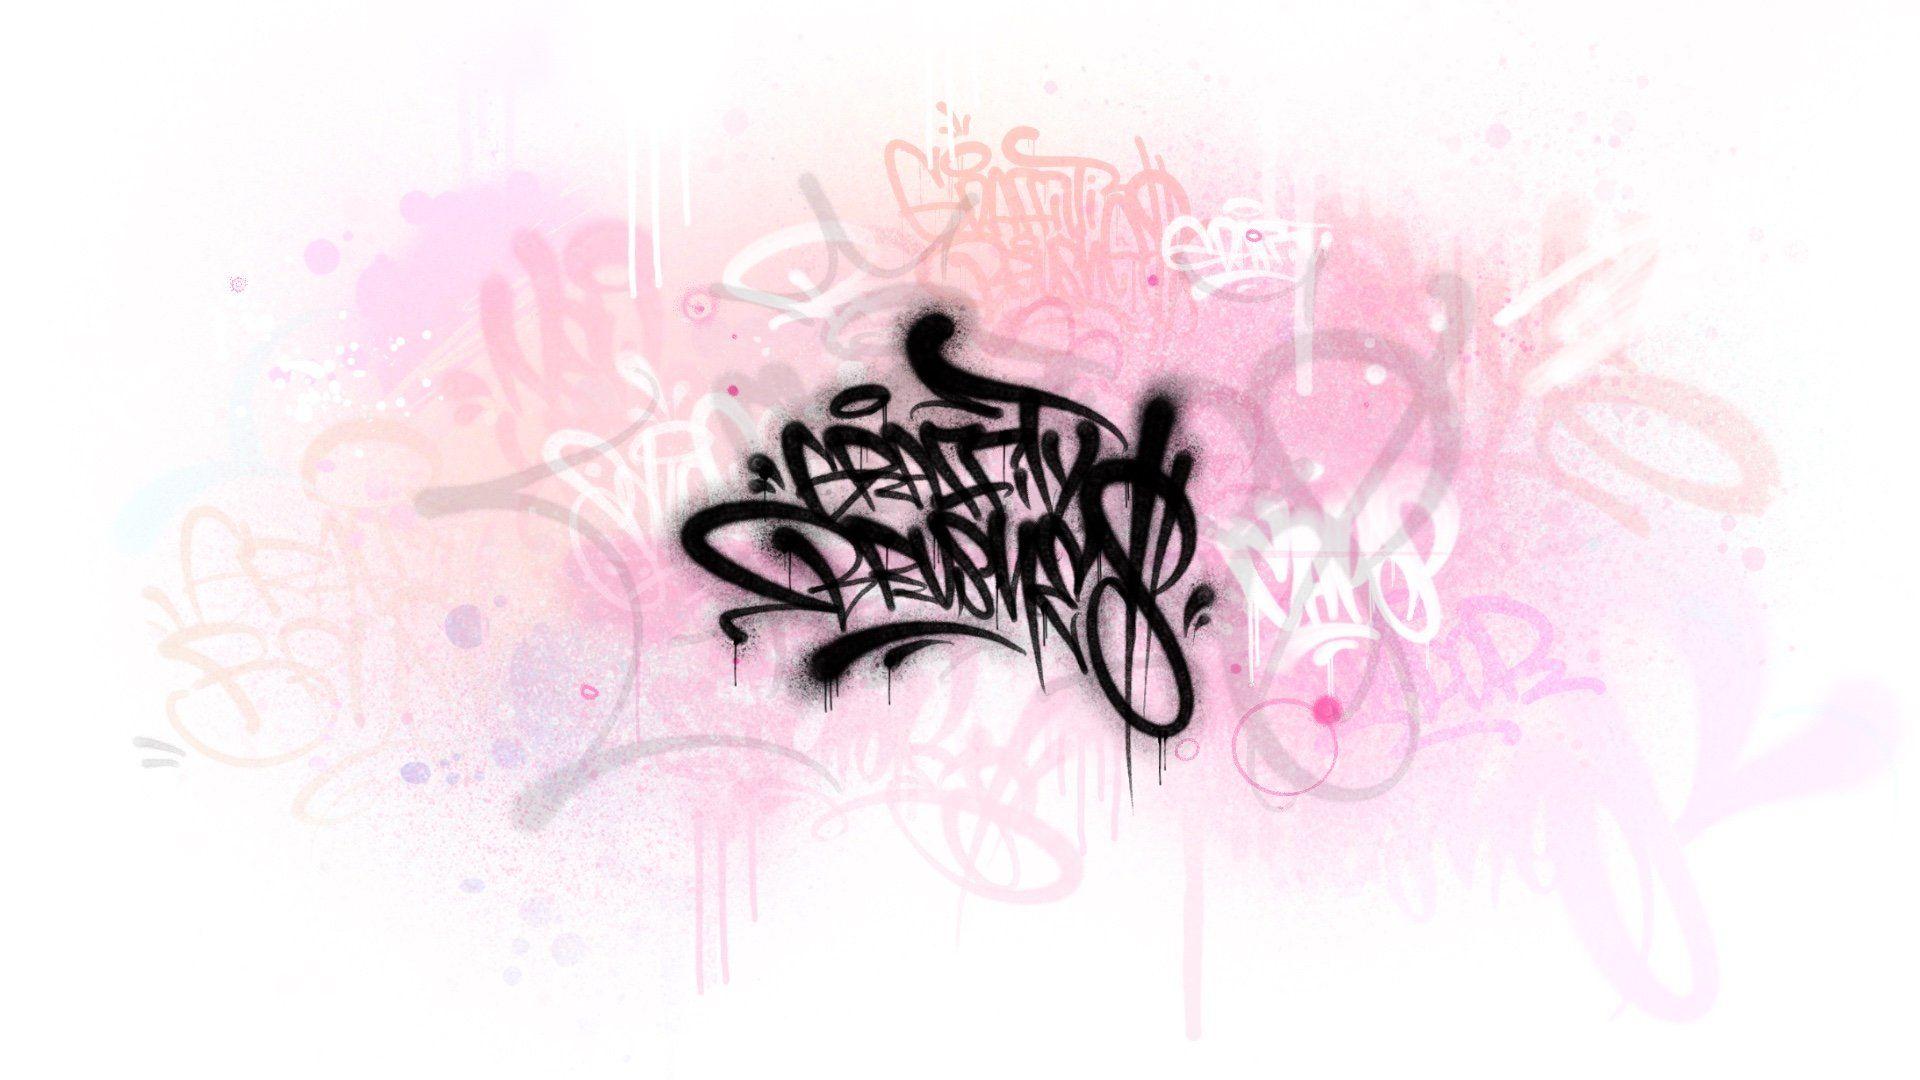 Graffiti Brush Set for iPad Pro Procreate App Procreate